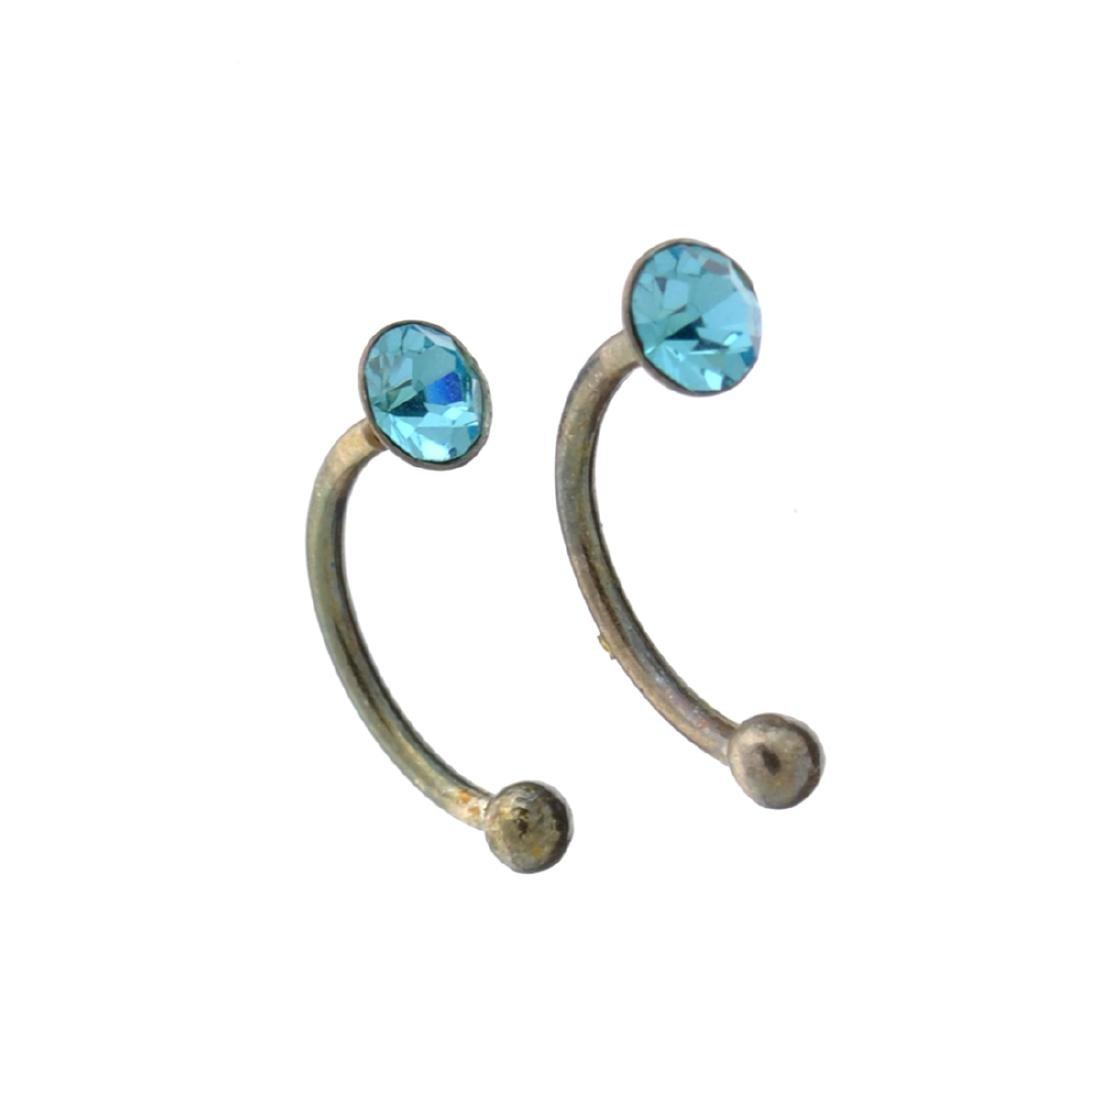 Gorgeous Sterling Silver Earrings